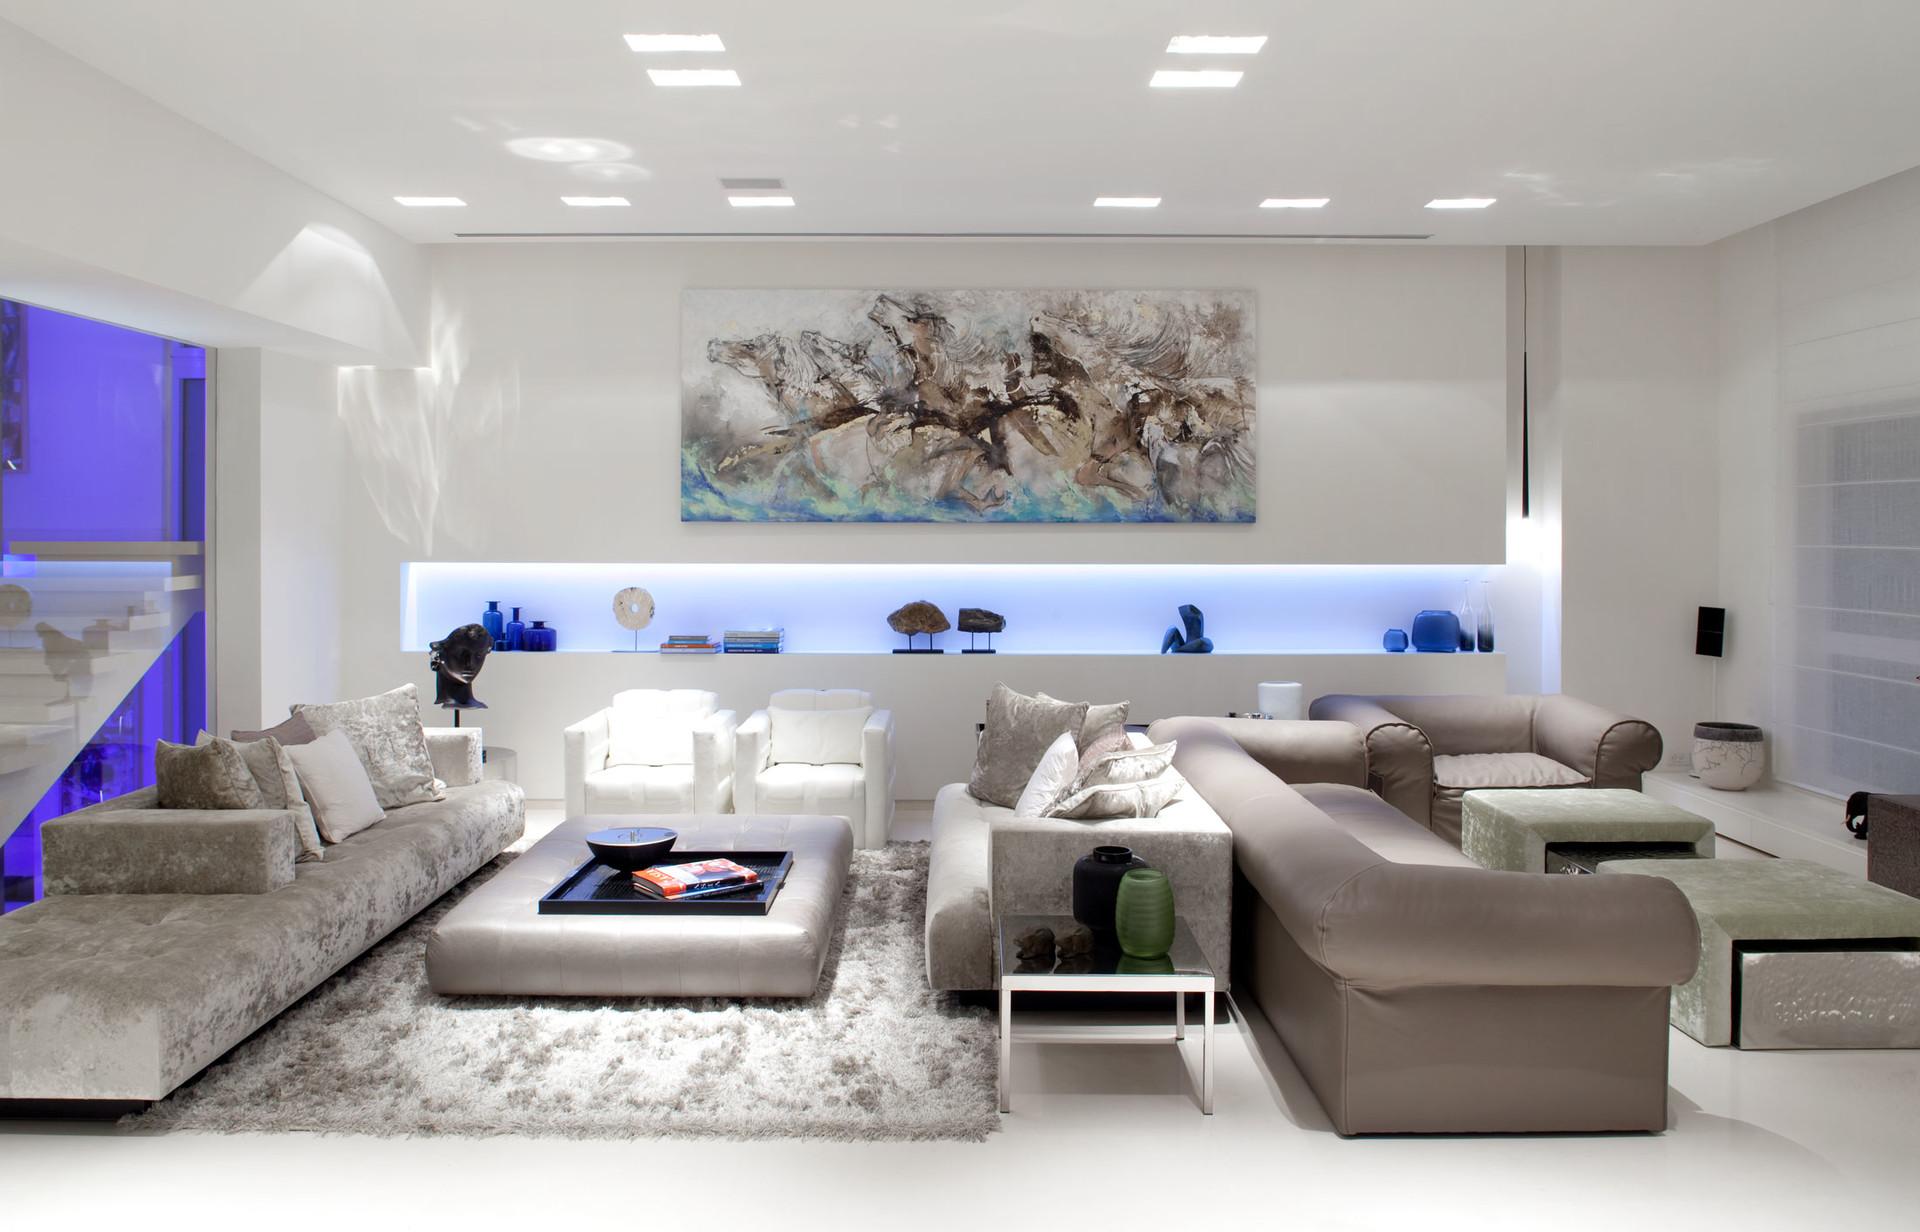 Licht Spots Inbouw : Led inbouw plafond lampen en led spotjes led lampen partner